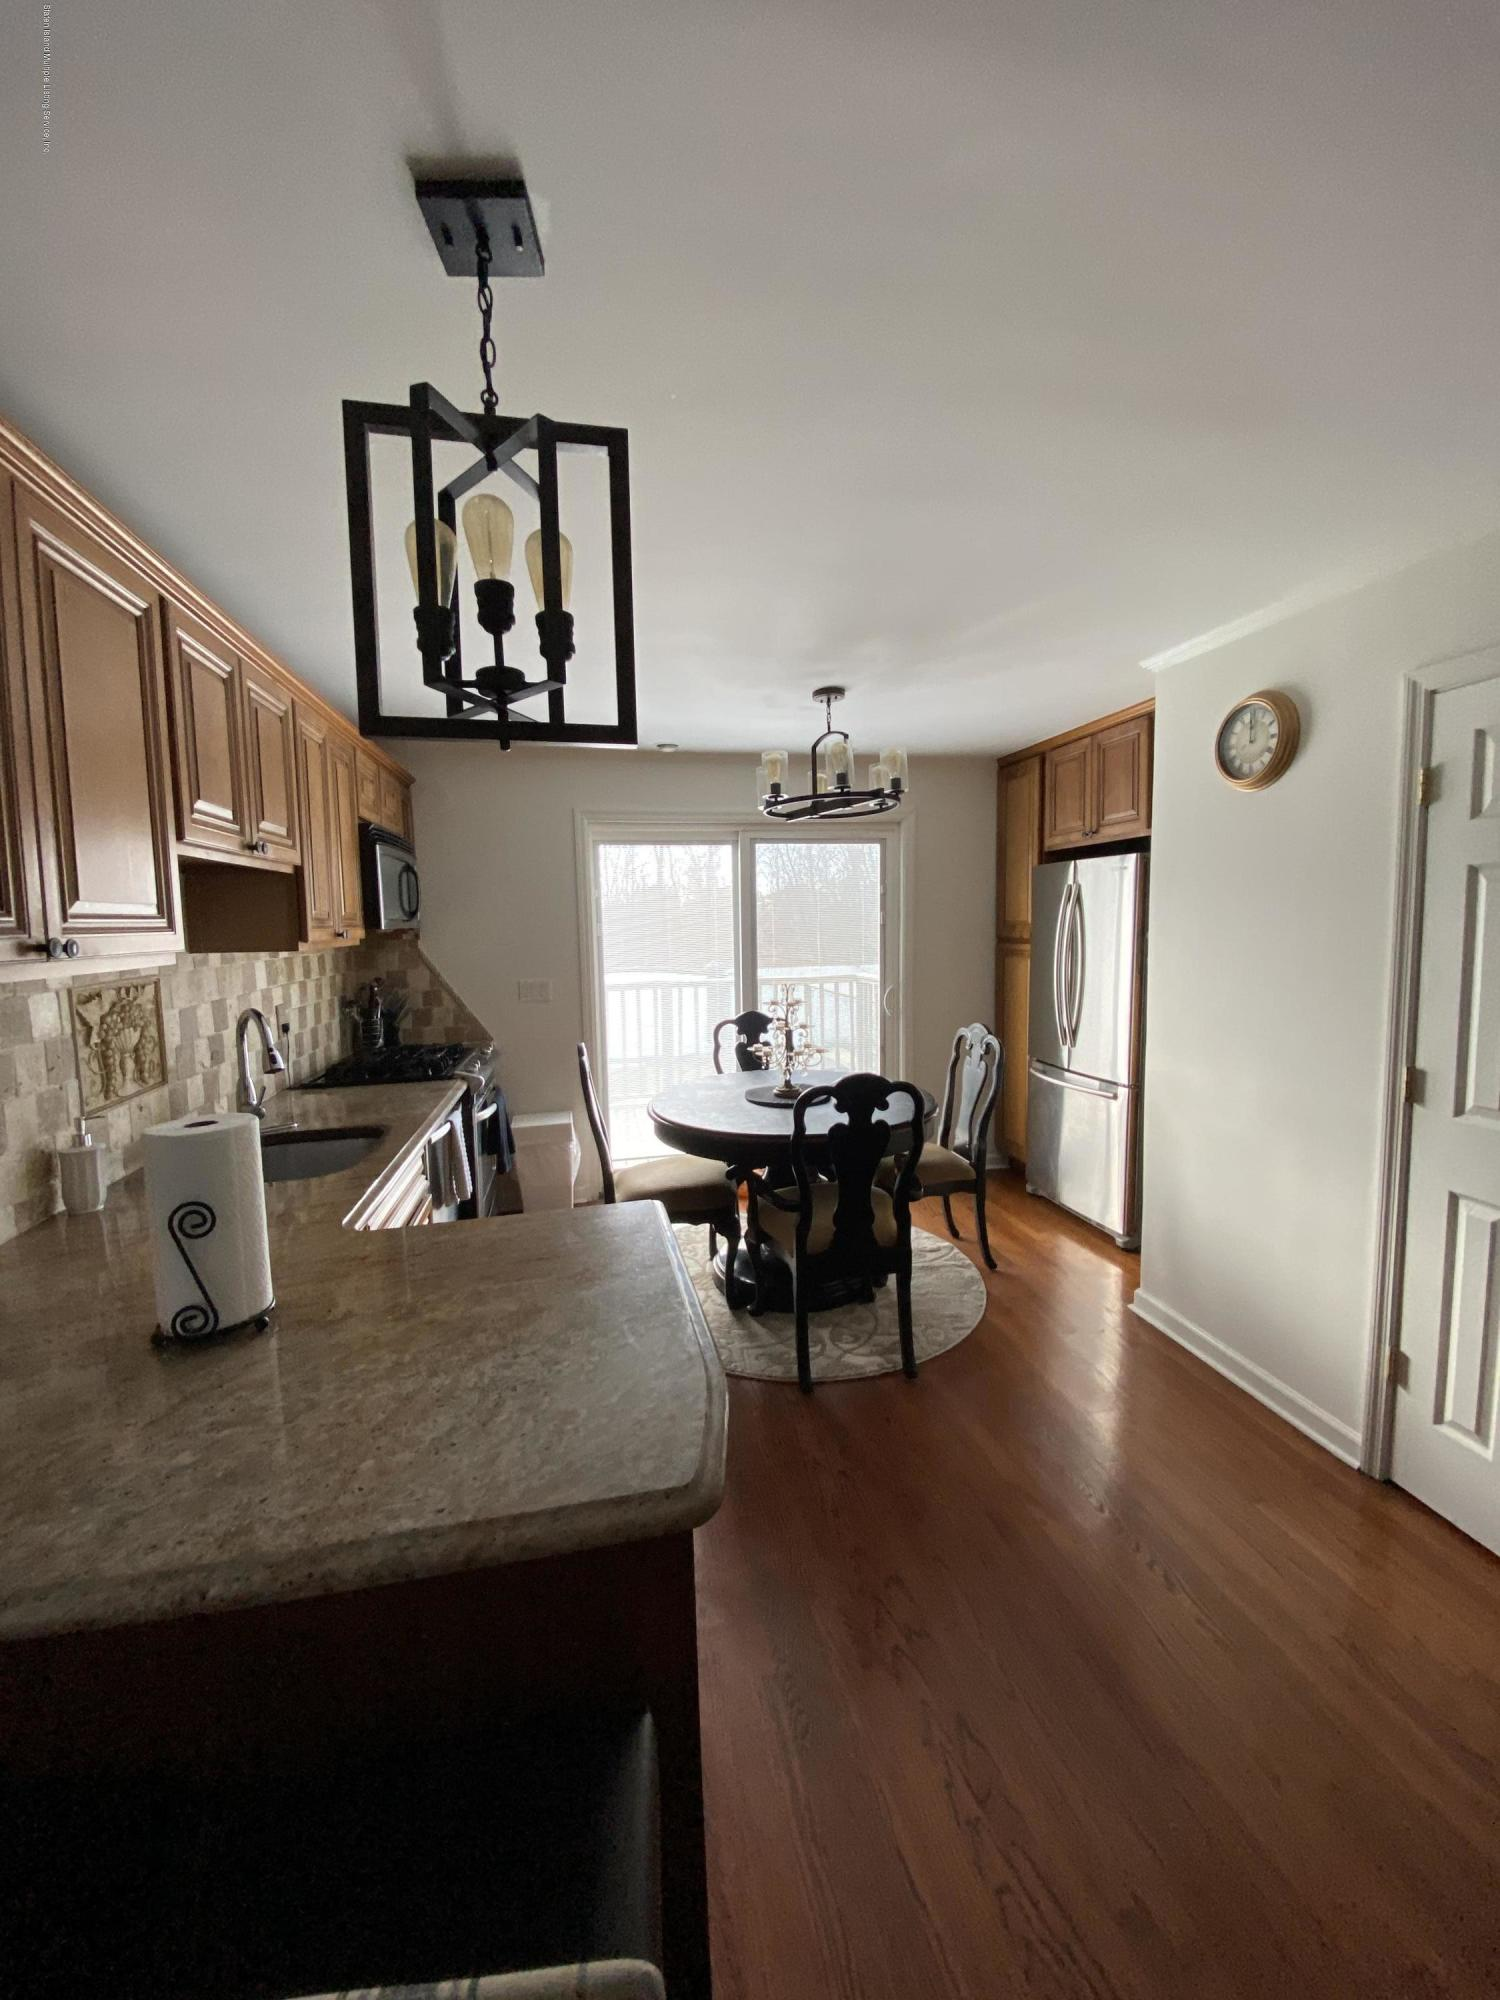 Single Family - Semi-Attached 370 Seaver Avenue  Staten Island, NY 10305, MLS-1136339-5